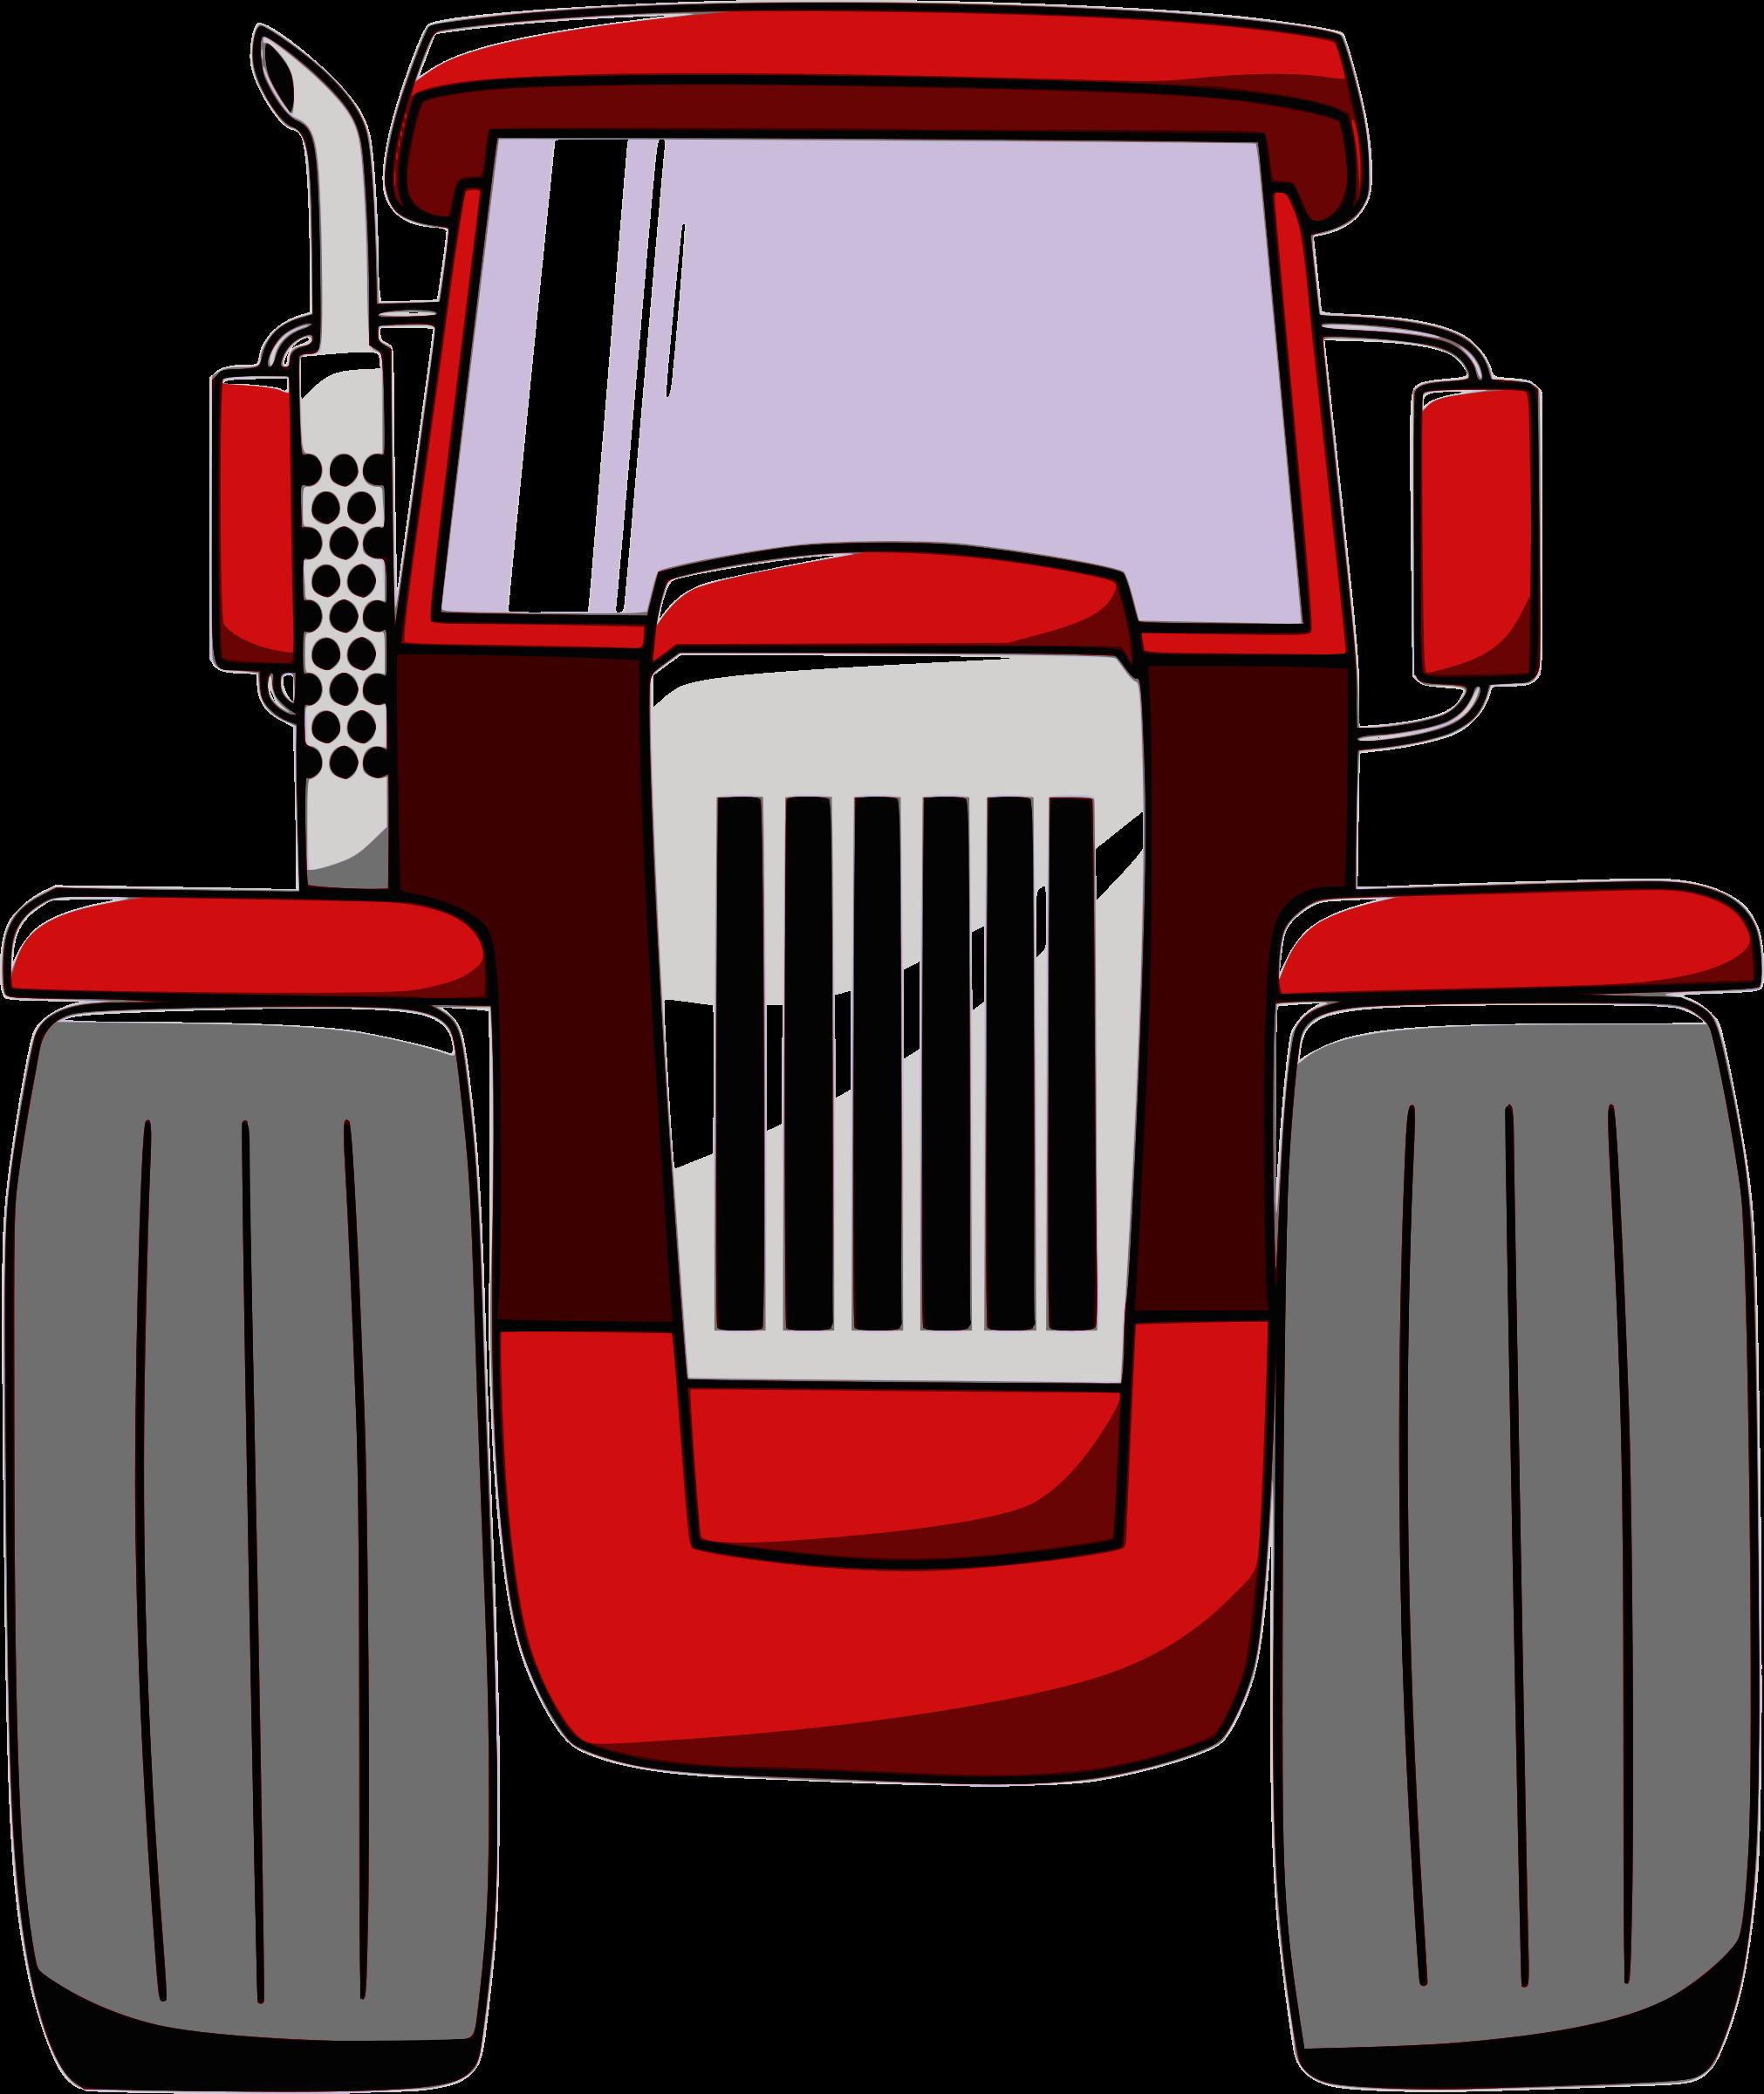 Big image png. Farmer clipart tractor